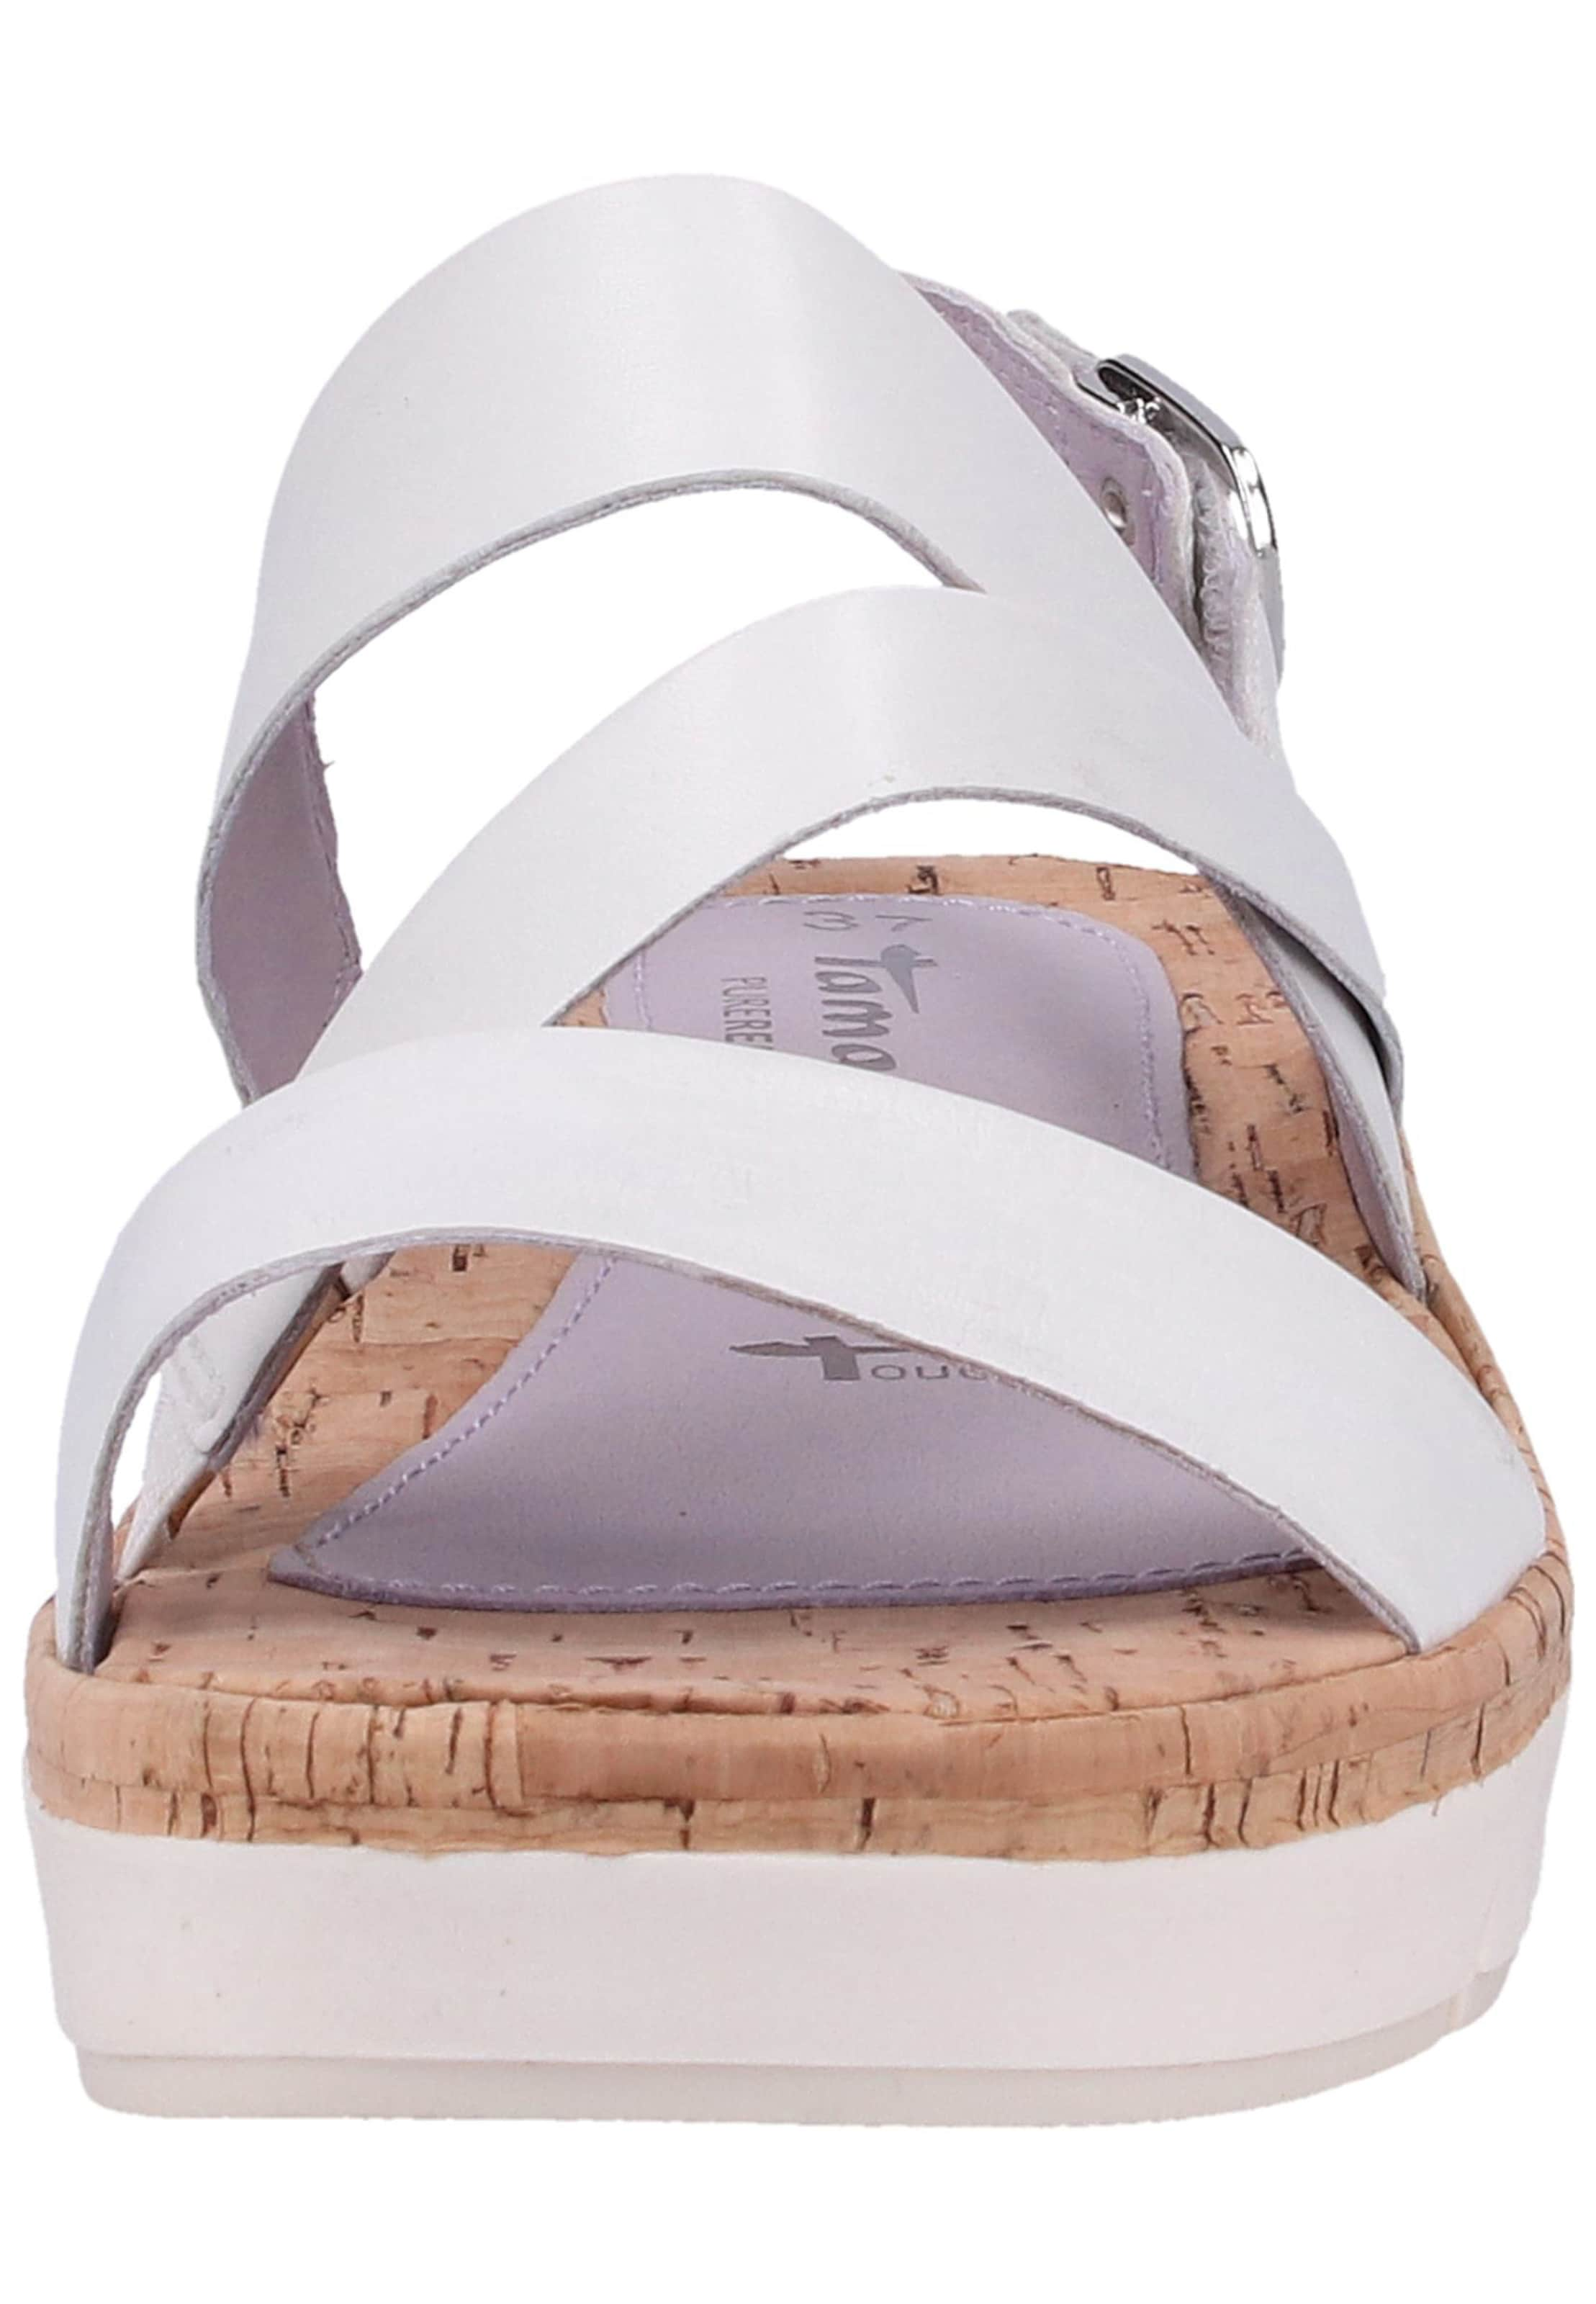 En Sandales Blanc À Tamaris Lanières nkwPOX80